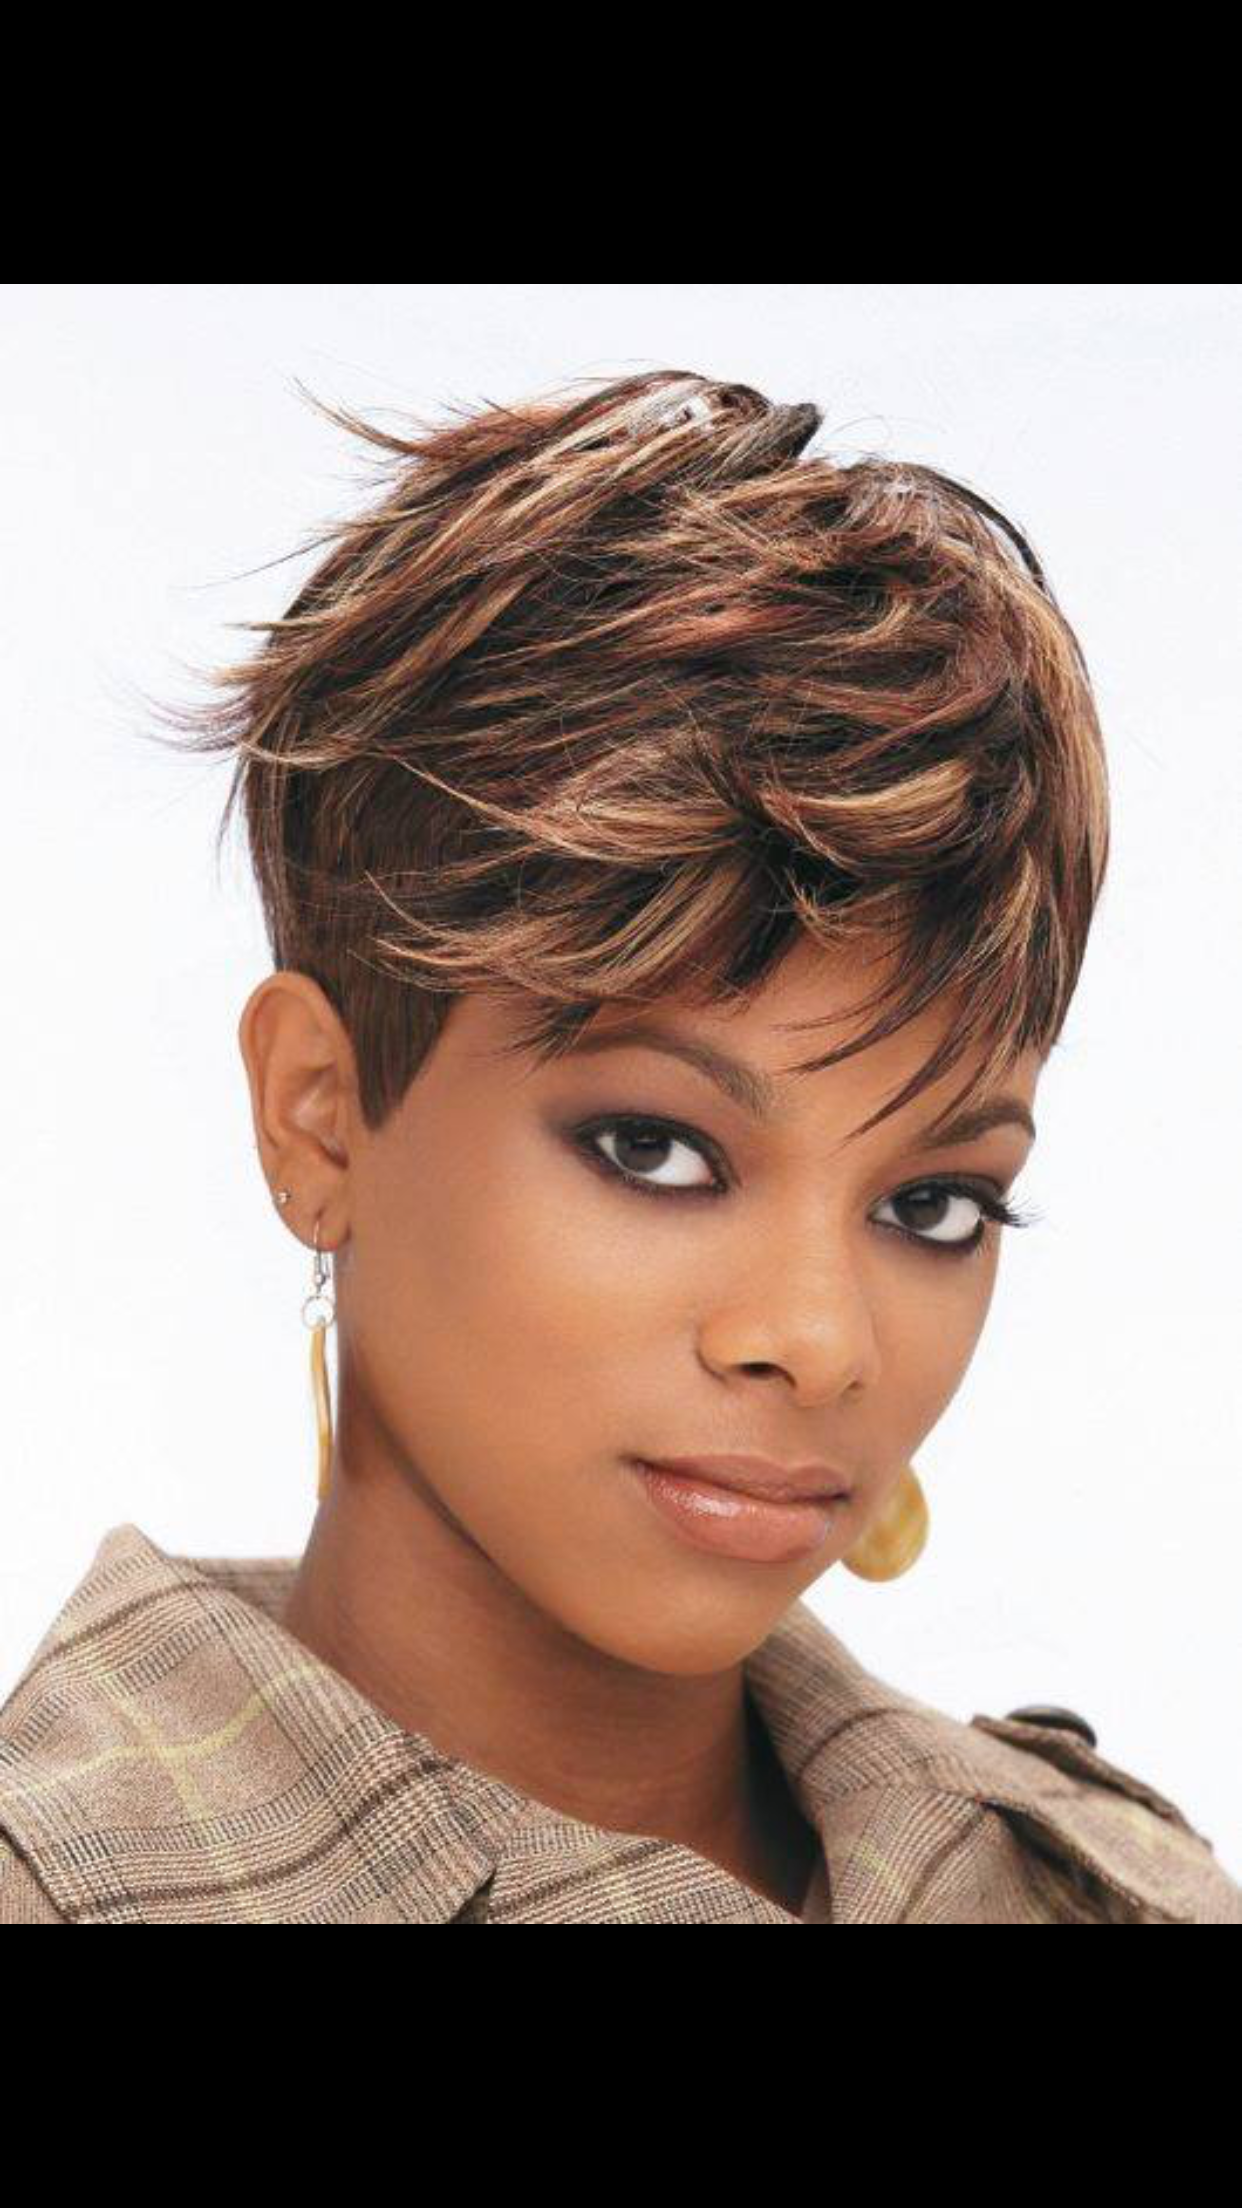 Pin By Vidette Barber On Short Hair Short Hair Styles Edgy Short Haircuts Hype Hair